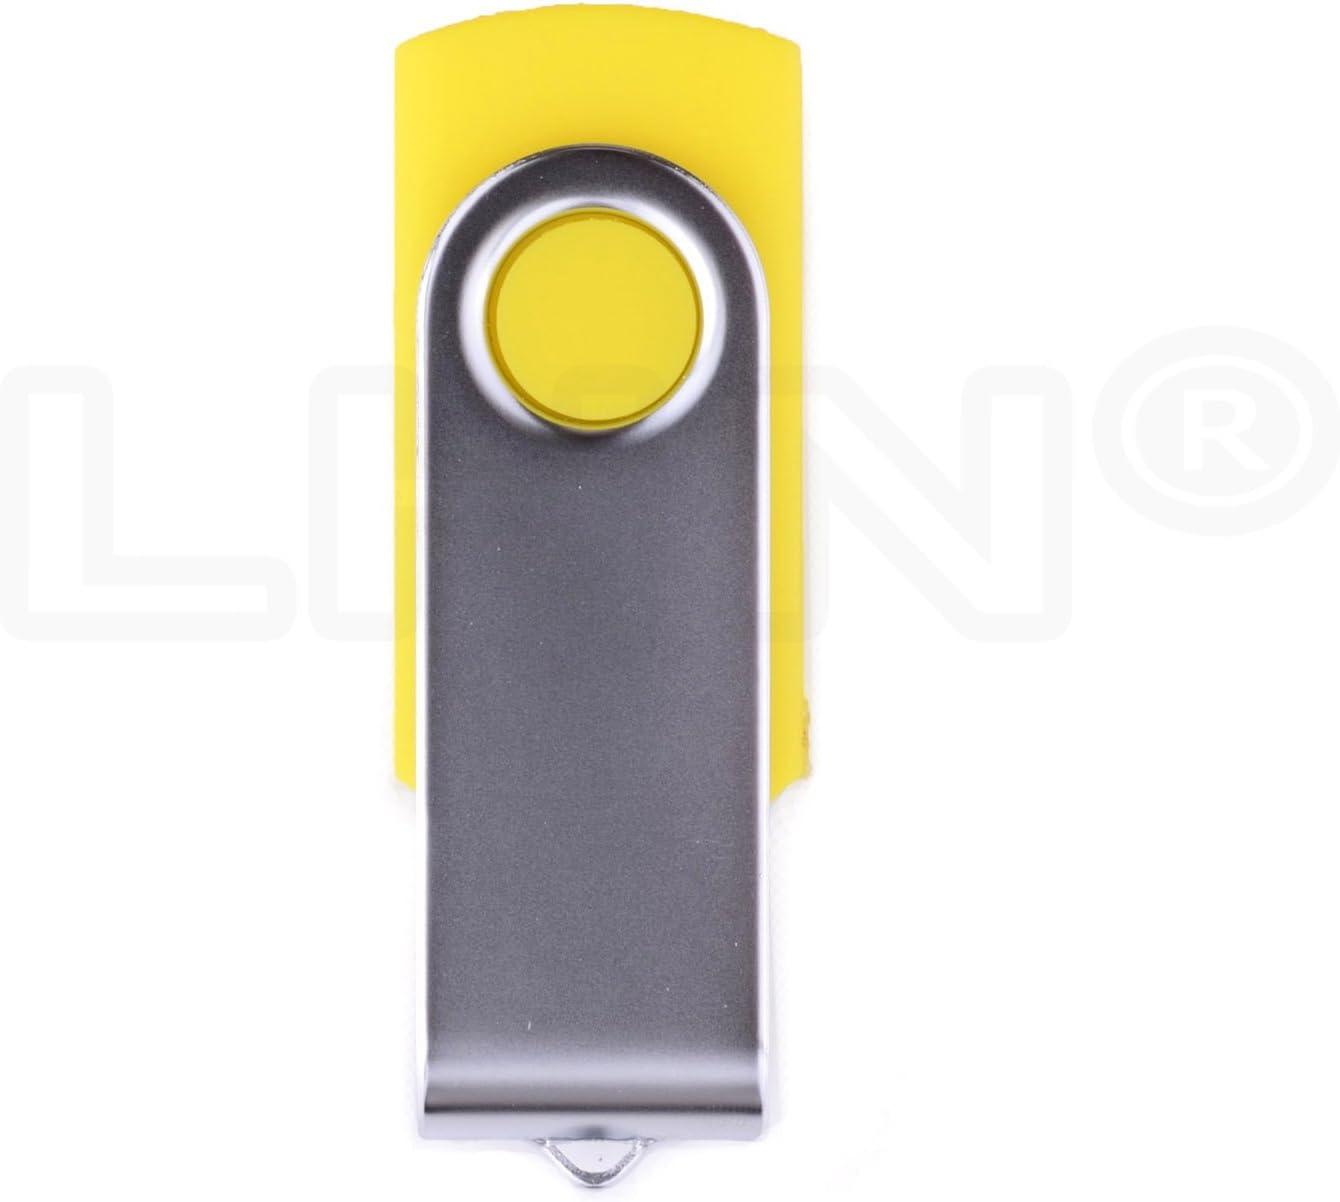 4GB Swivel USB Flash Drive USB 2.0 Memory Stick LHN Bulk 5 Pack Yellow